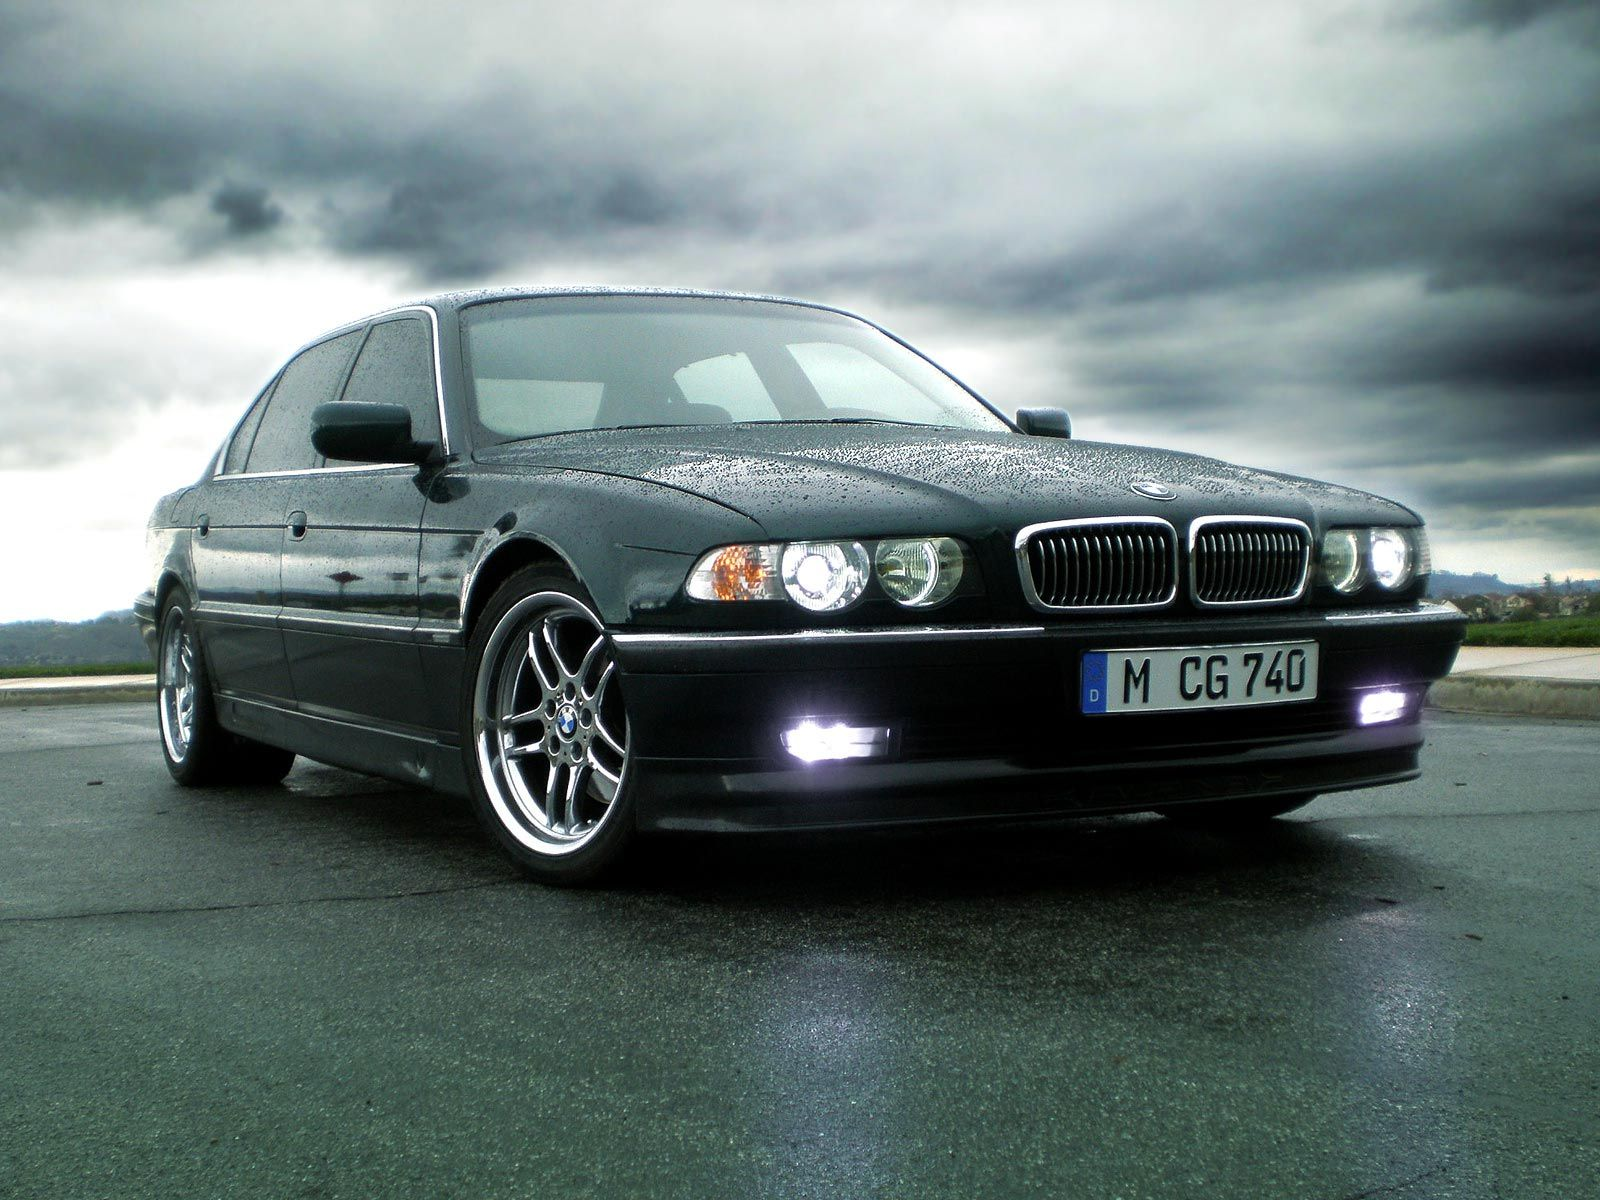 BMW Series E I I Own This Car Right Now Same Color Even - 740 i bmw